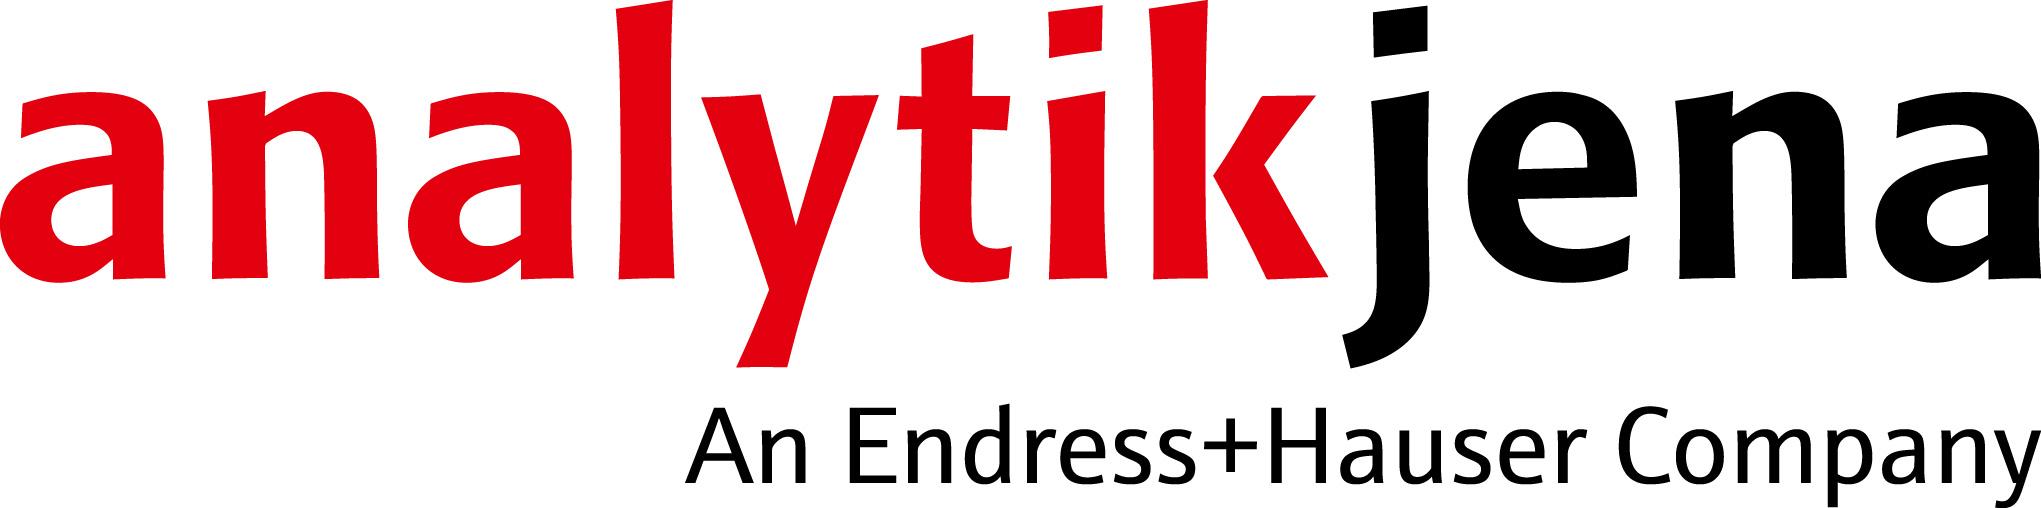 2016_Analytik-Jena-Logo